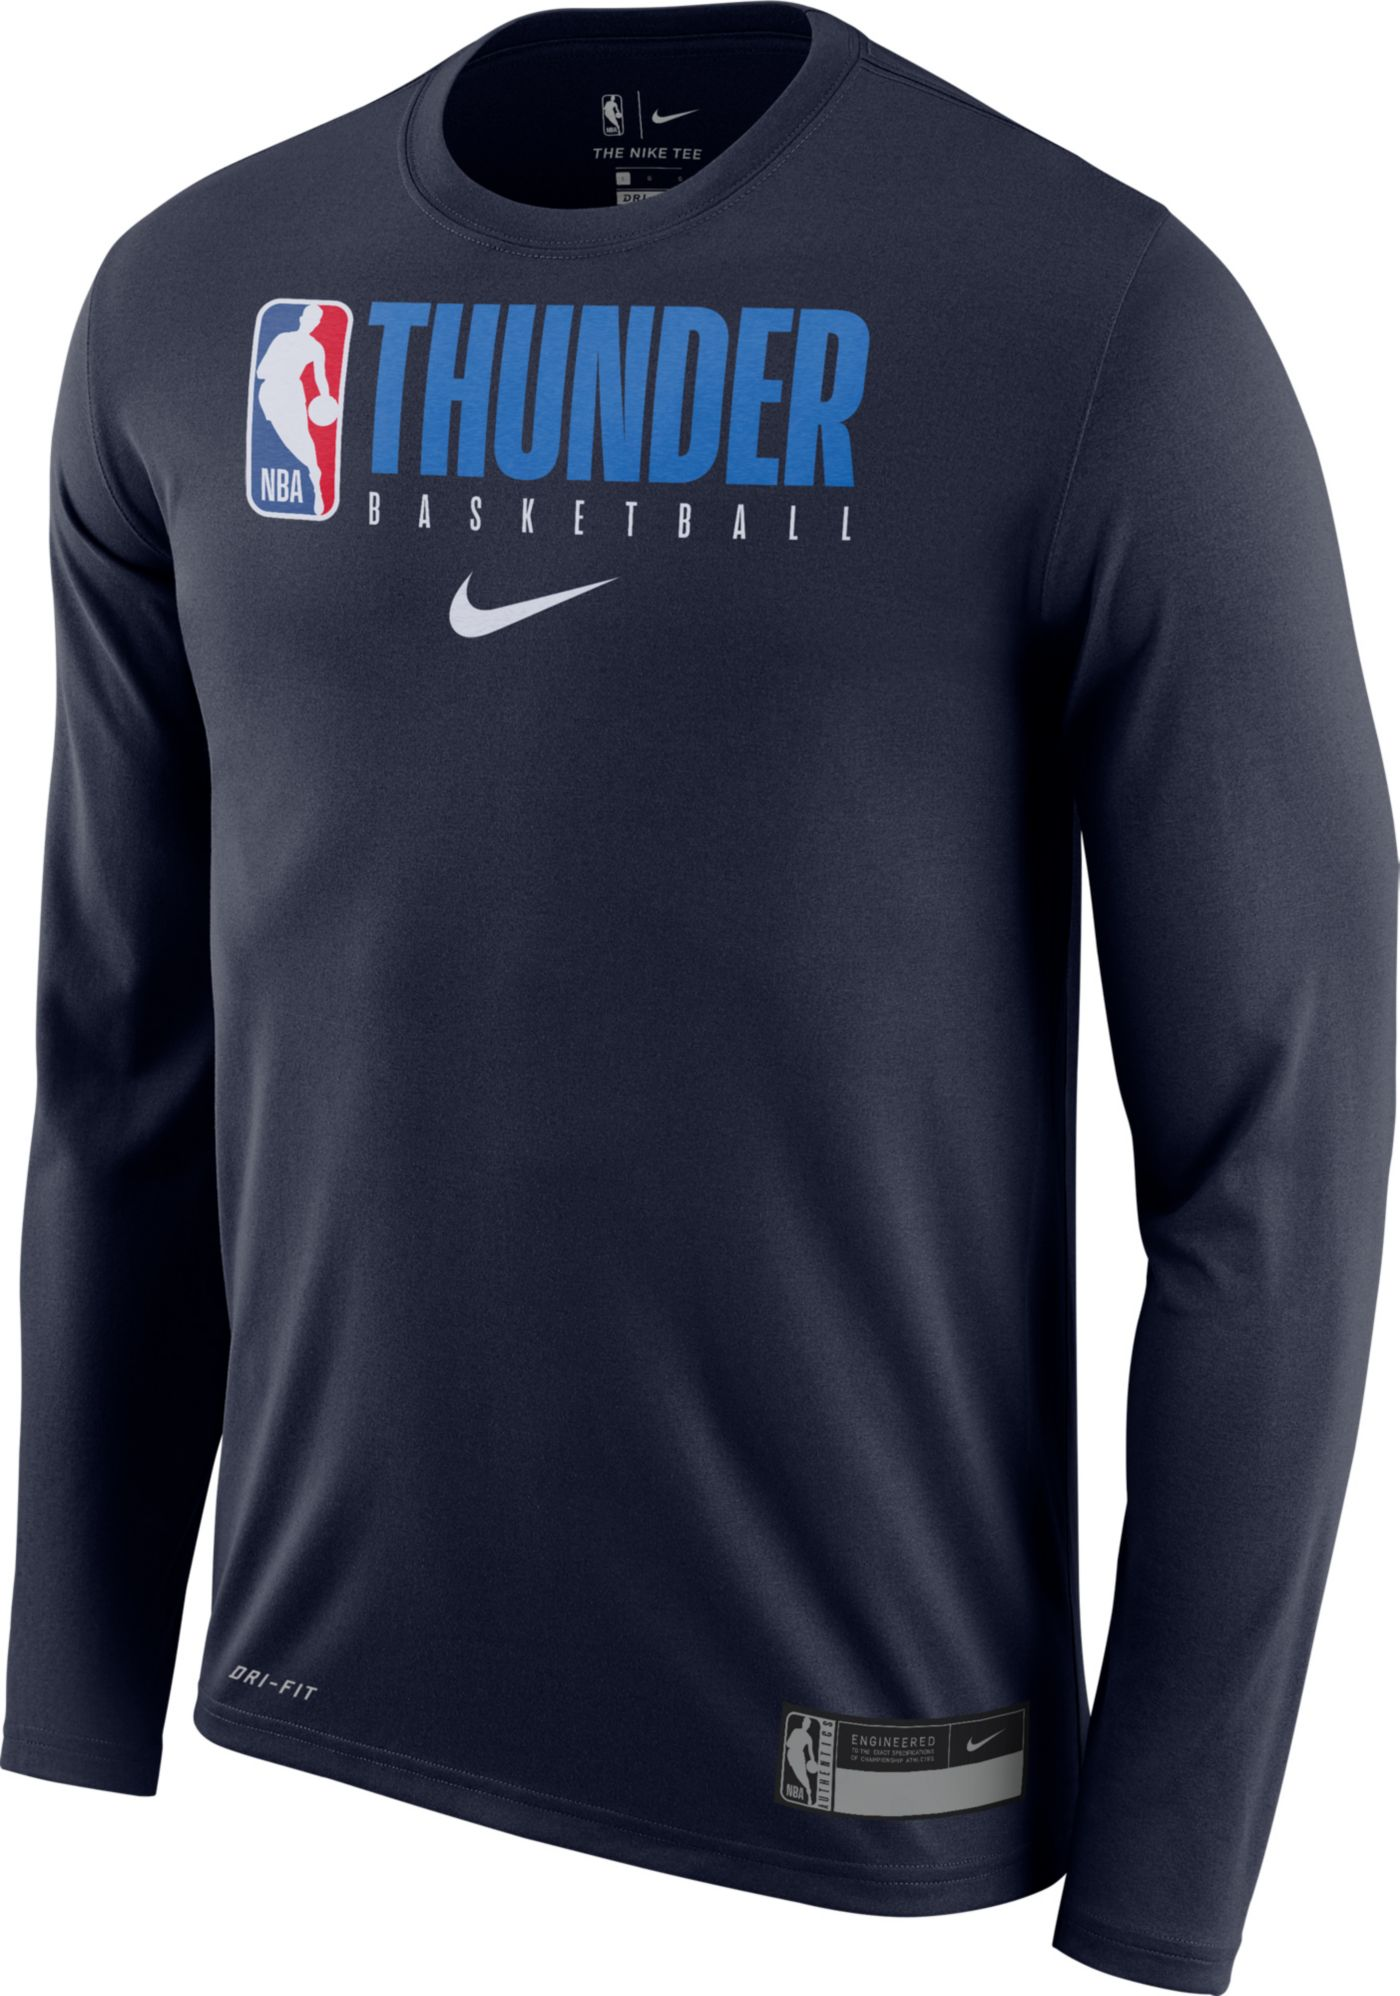 Nike Men's Oklahoma City Thunder Dri-FIT Practice Long Sleeve Shirt